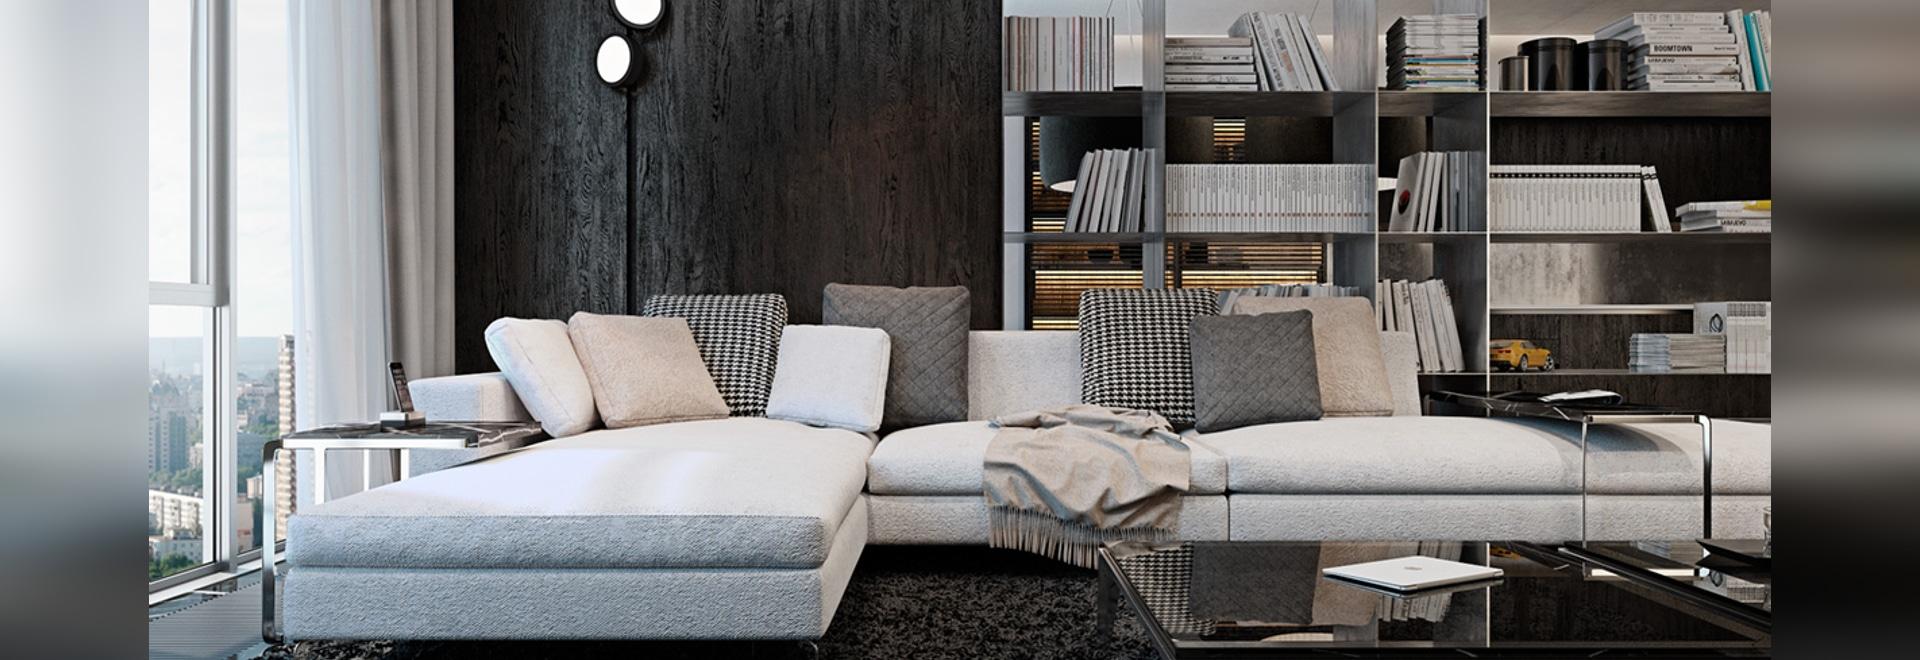 Three Luxurious Apartments With Dark Modern Interiors - Kiev, Ukraine